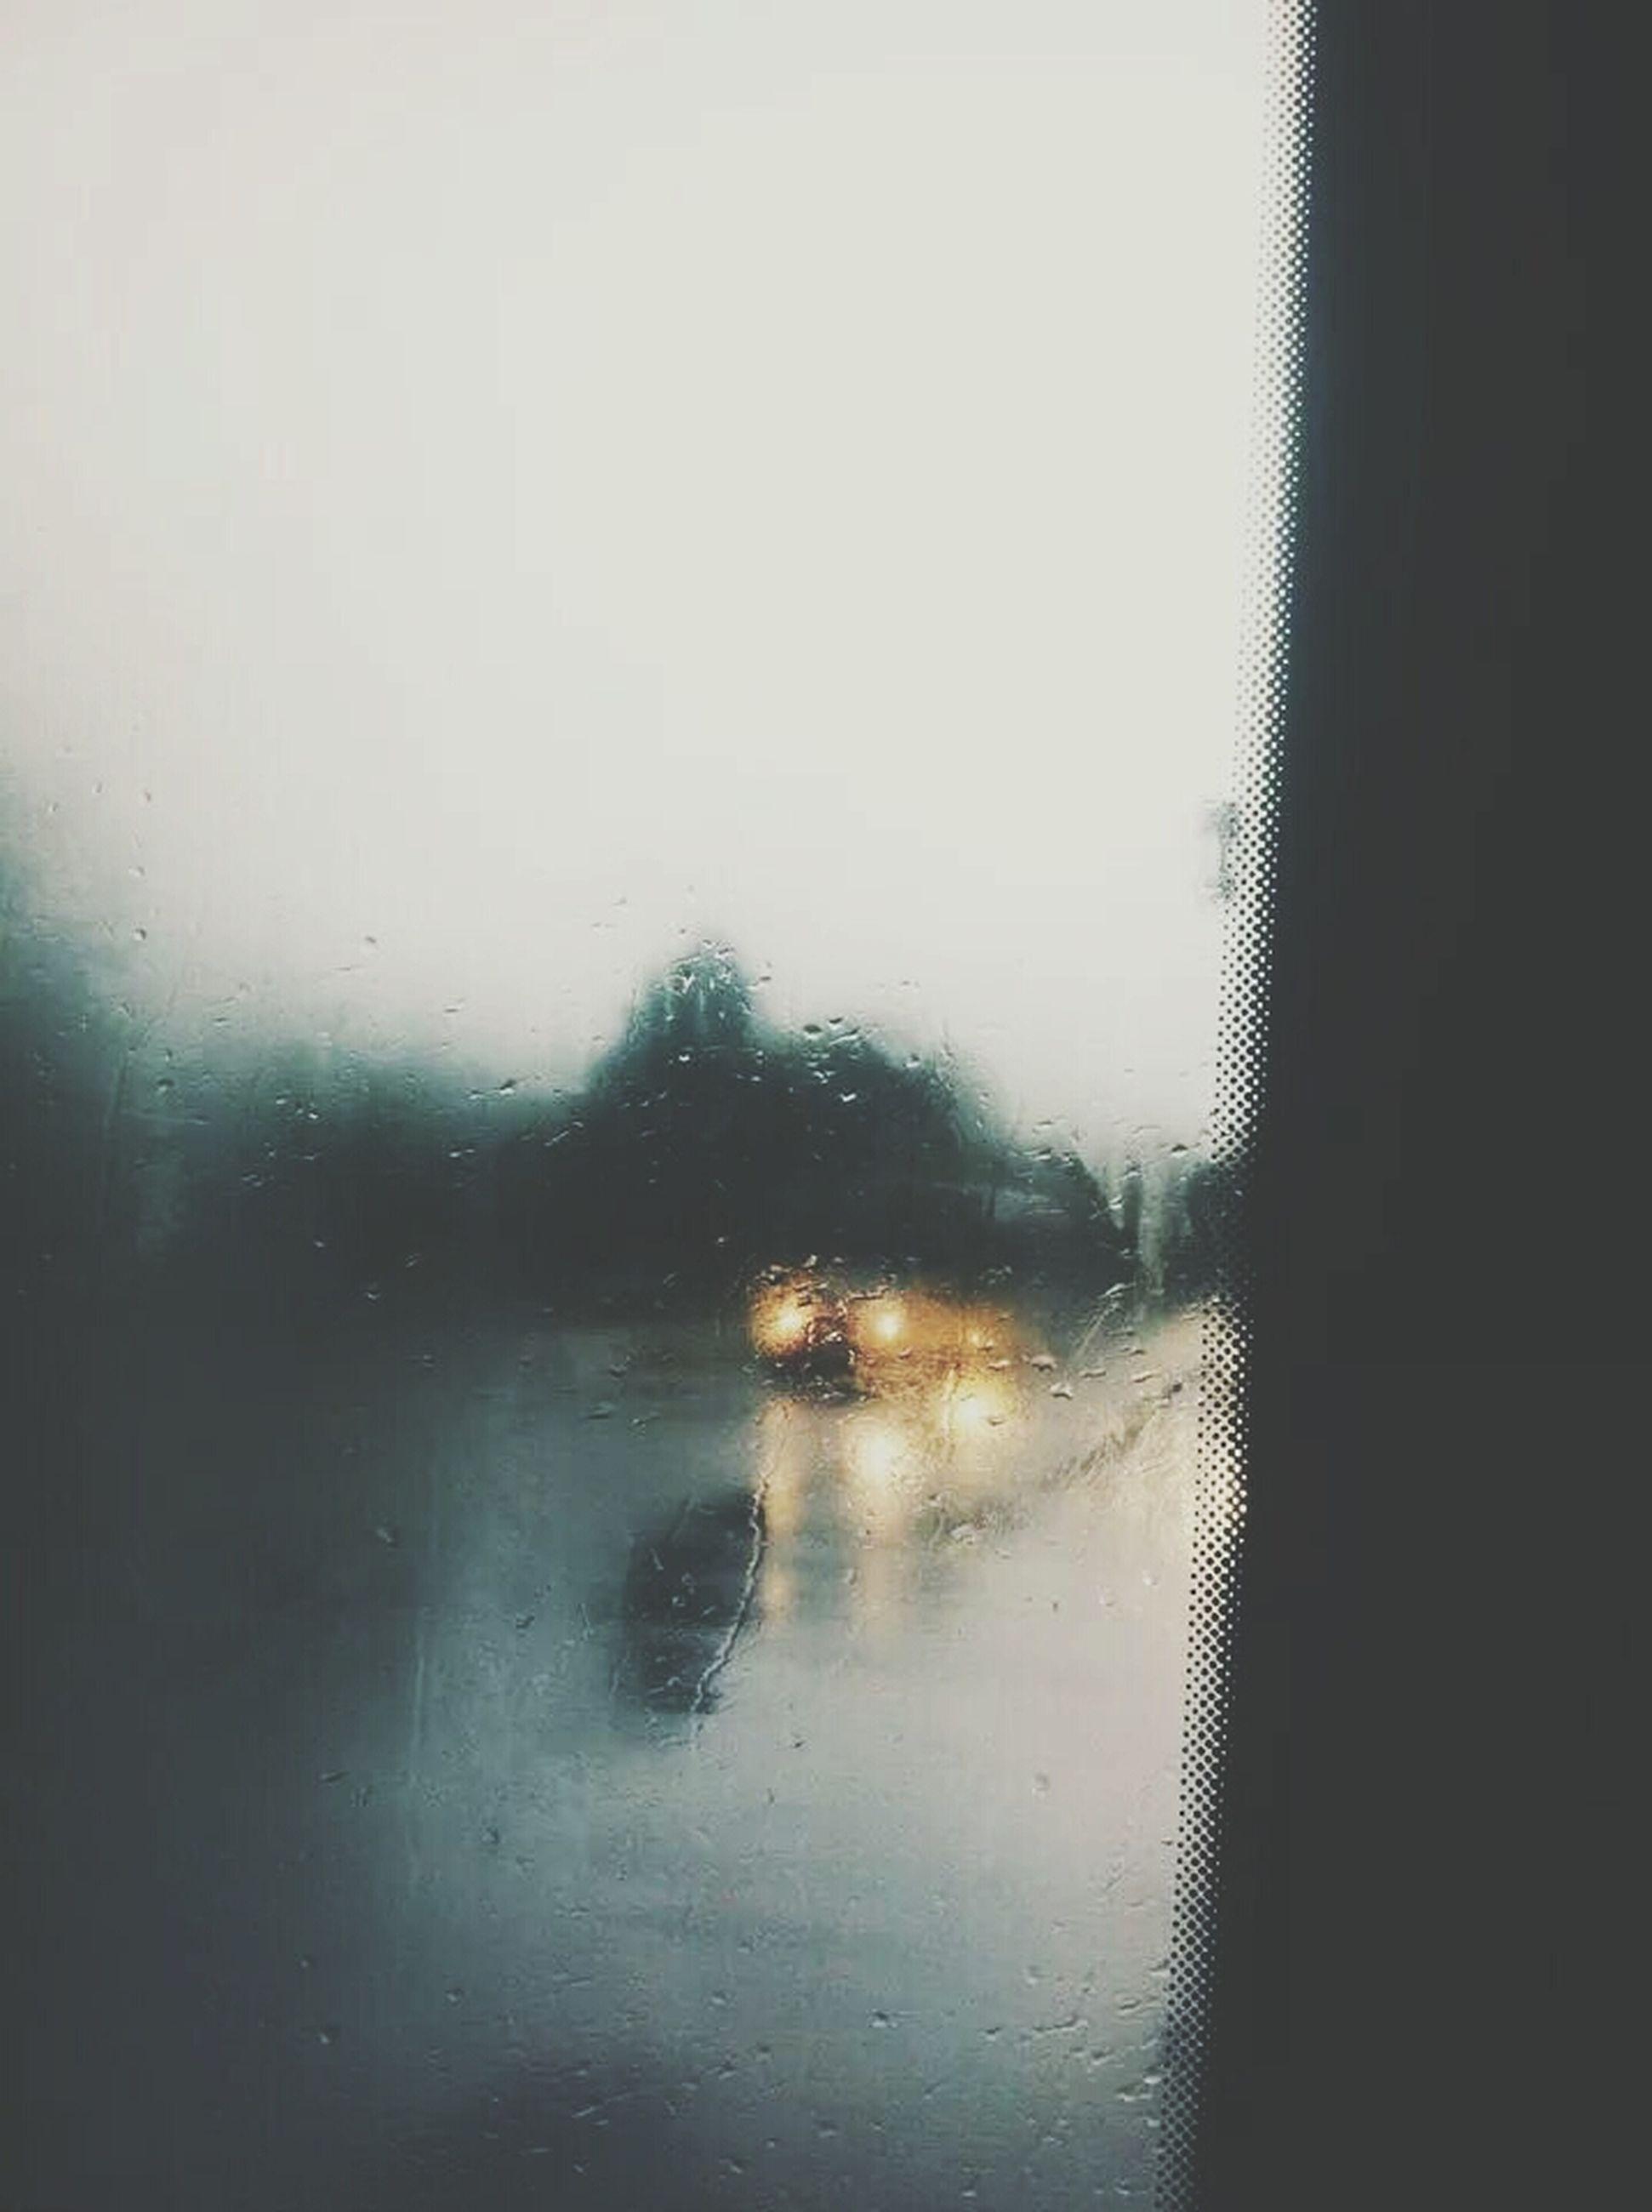 water, wet, window, drop, rain, transparent, glass - material, weather, season, indoors, transportation, raindrop, mode of transport, car, reflection, sky, monsoon, vehicle interior, land vehicle, glass